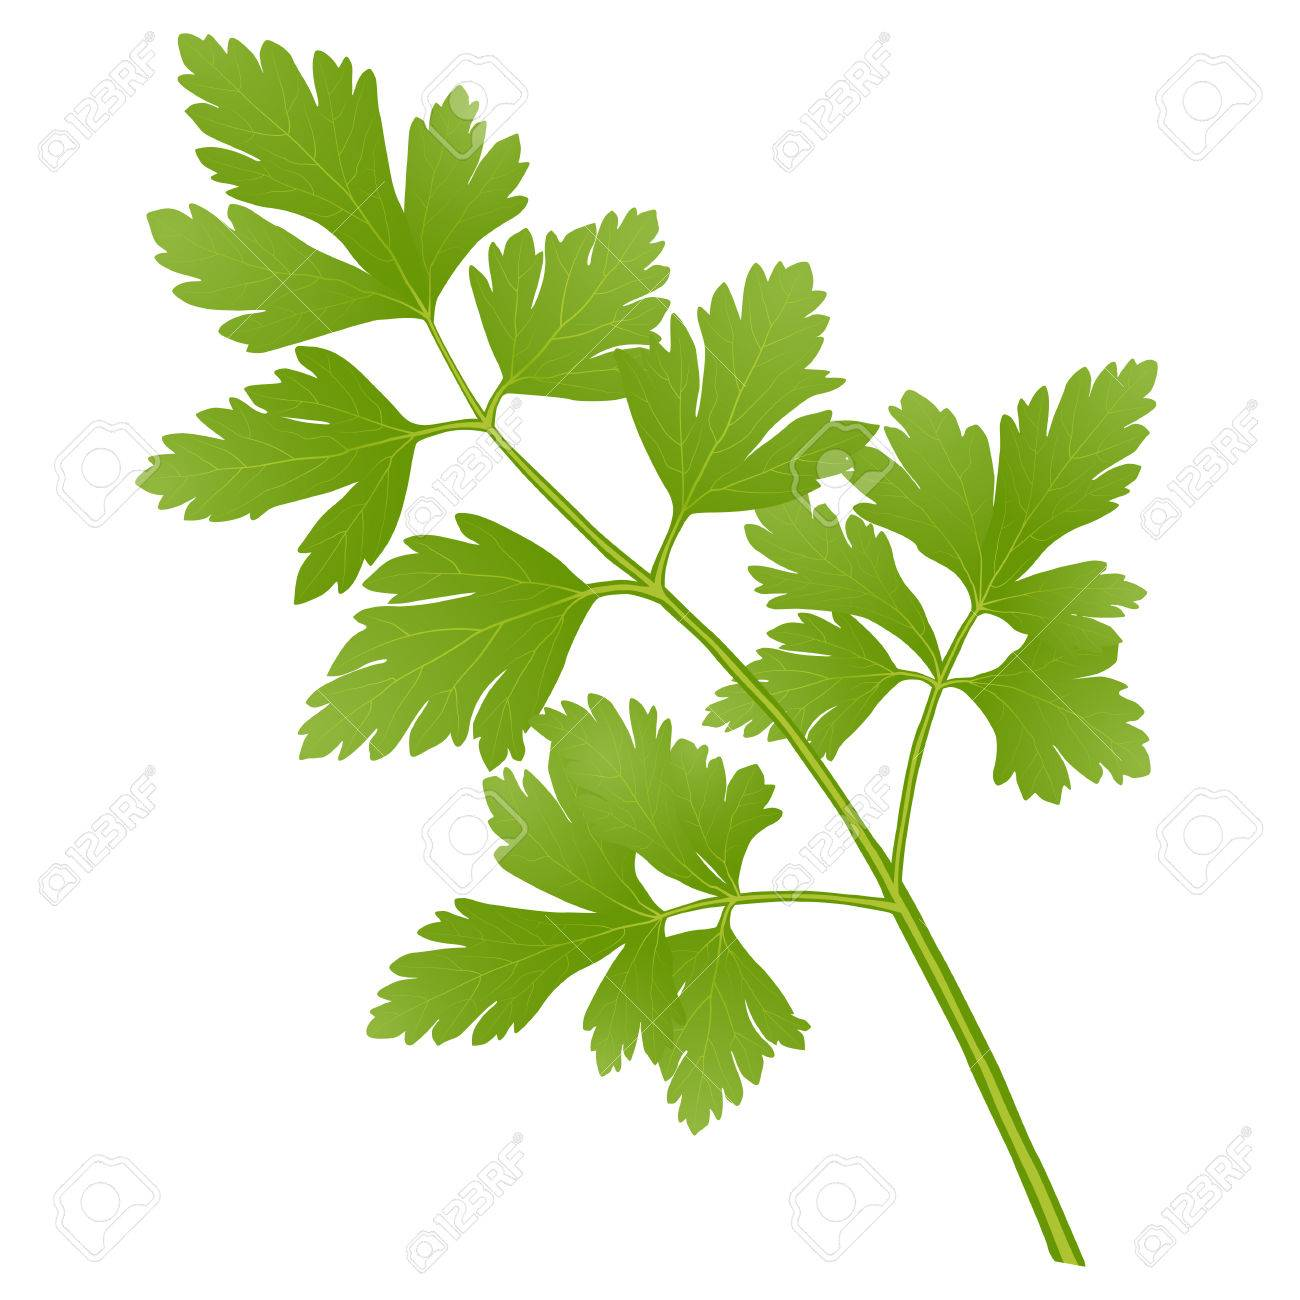 parsley - 68886701